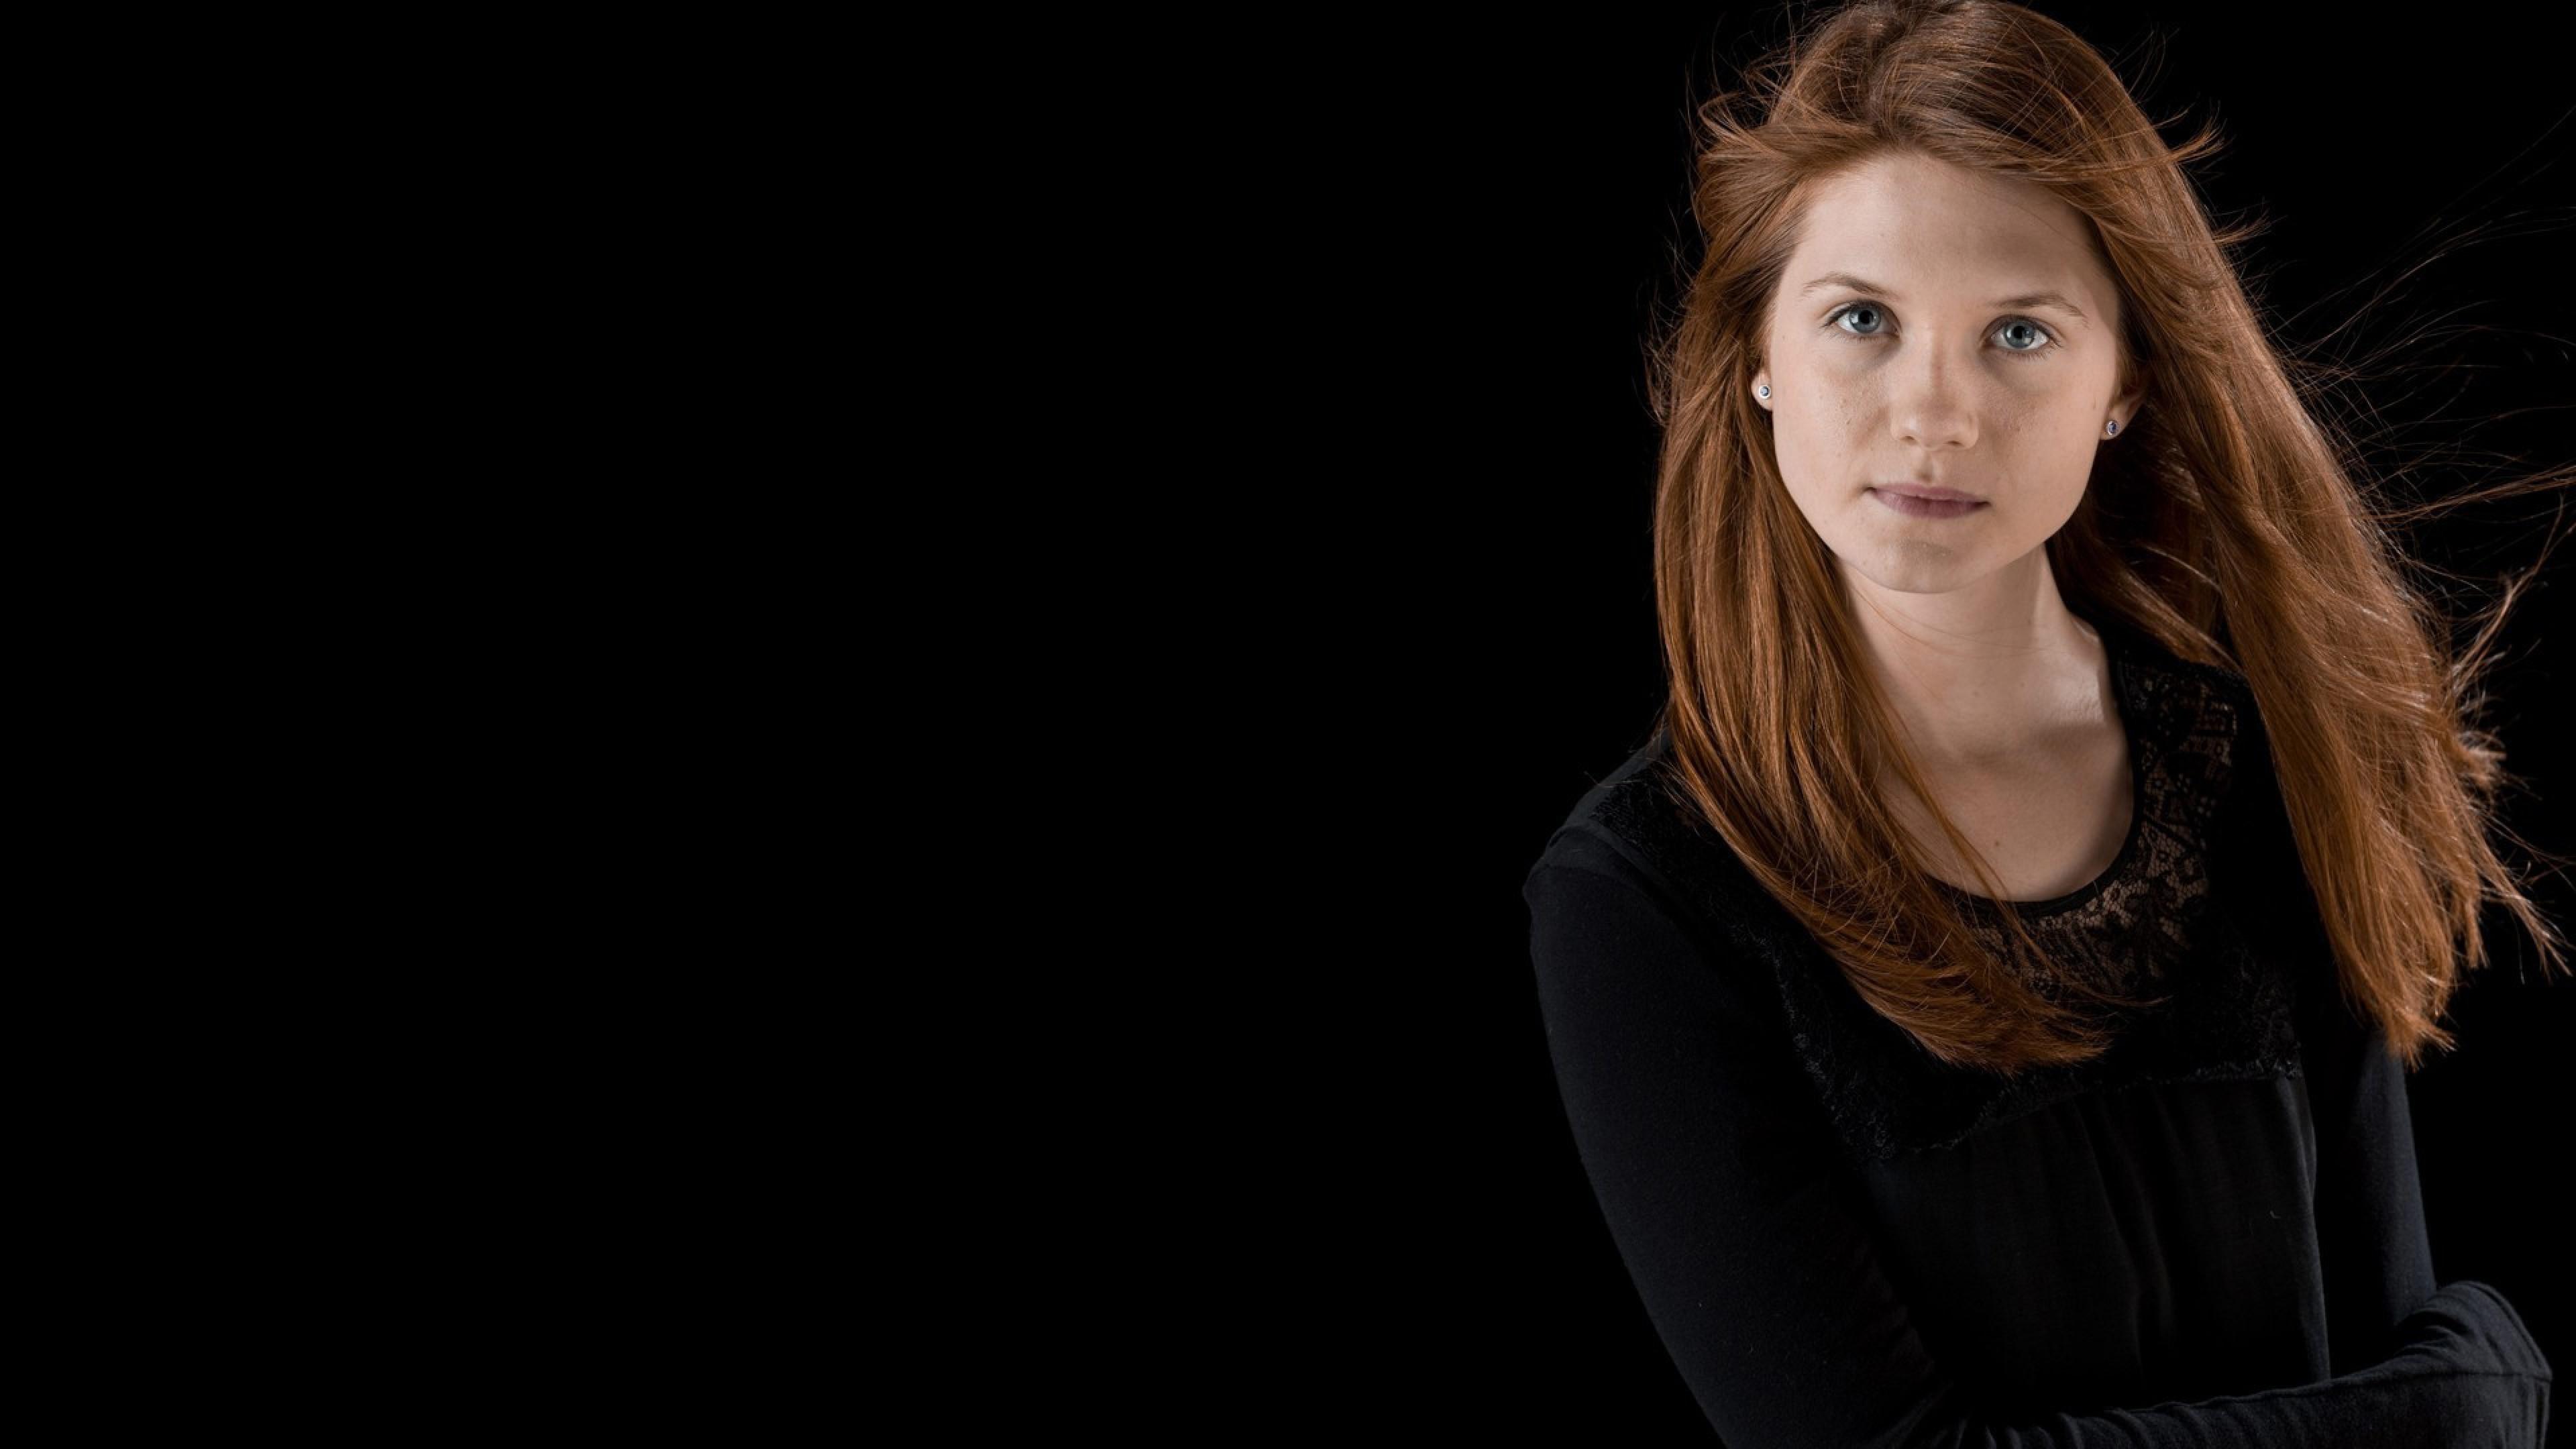 Wallpaper bonnie wright, actress, redhead